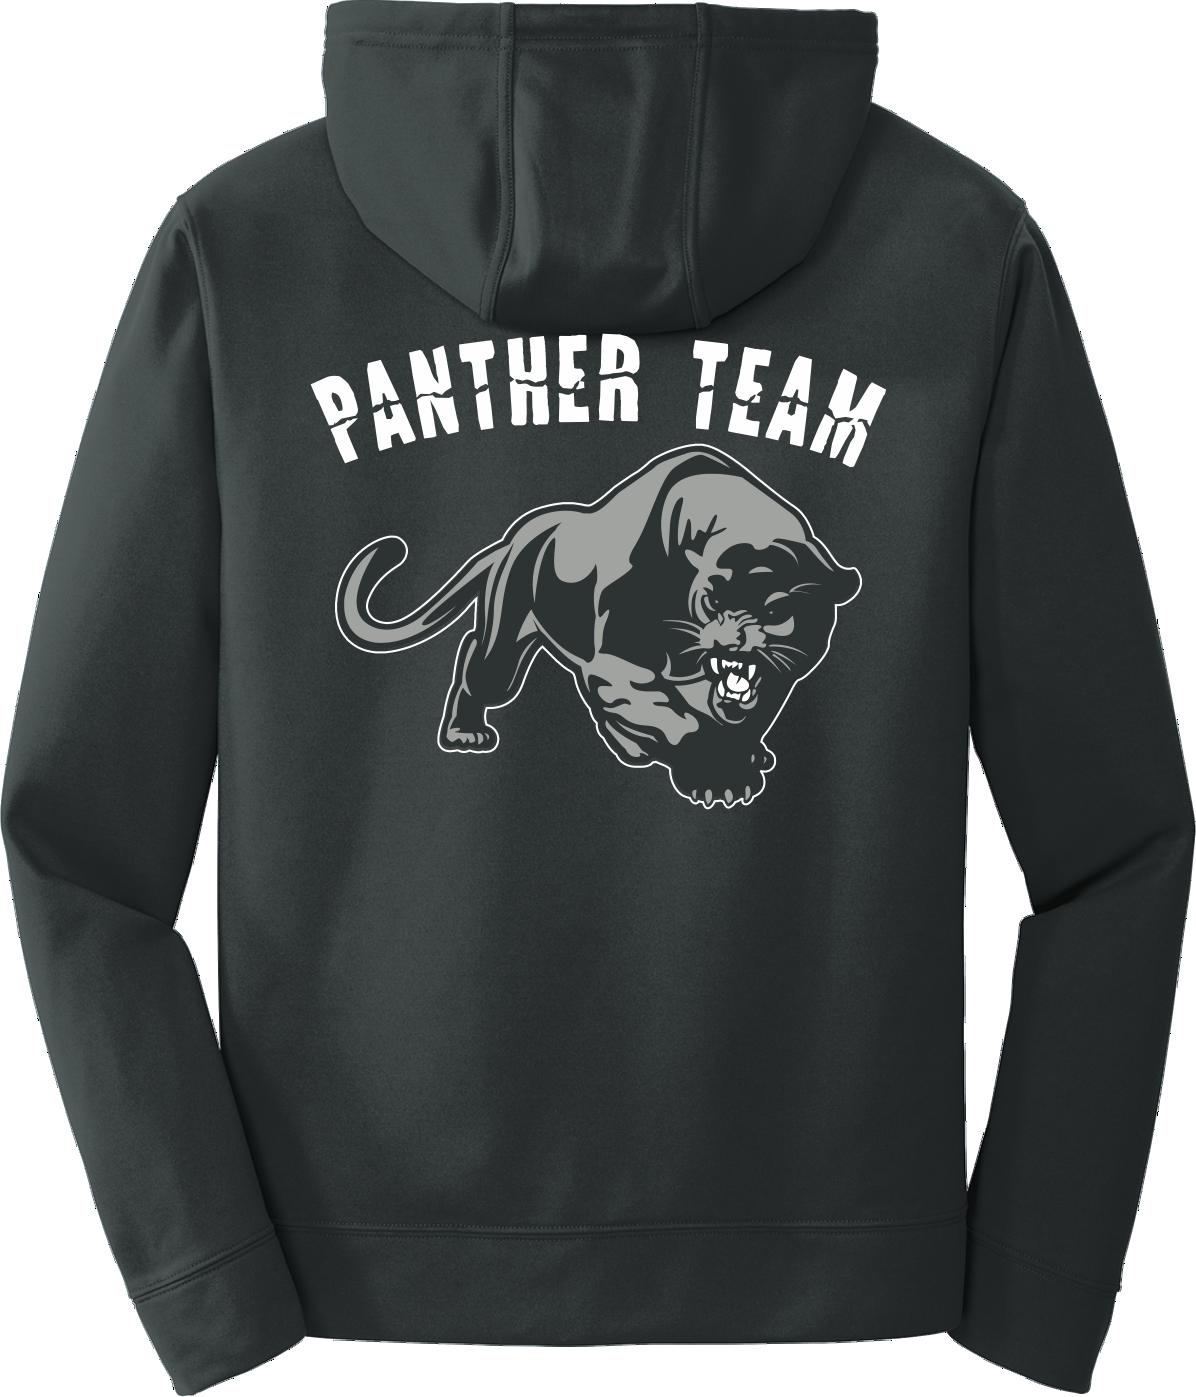 Black Poly Fleece Crew Hooded Sweatshirt-NO PROWL PPBLKHDYNOPR